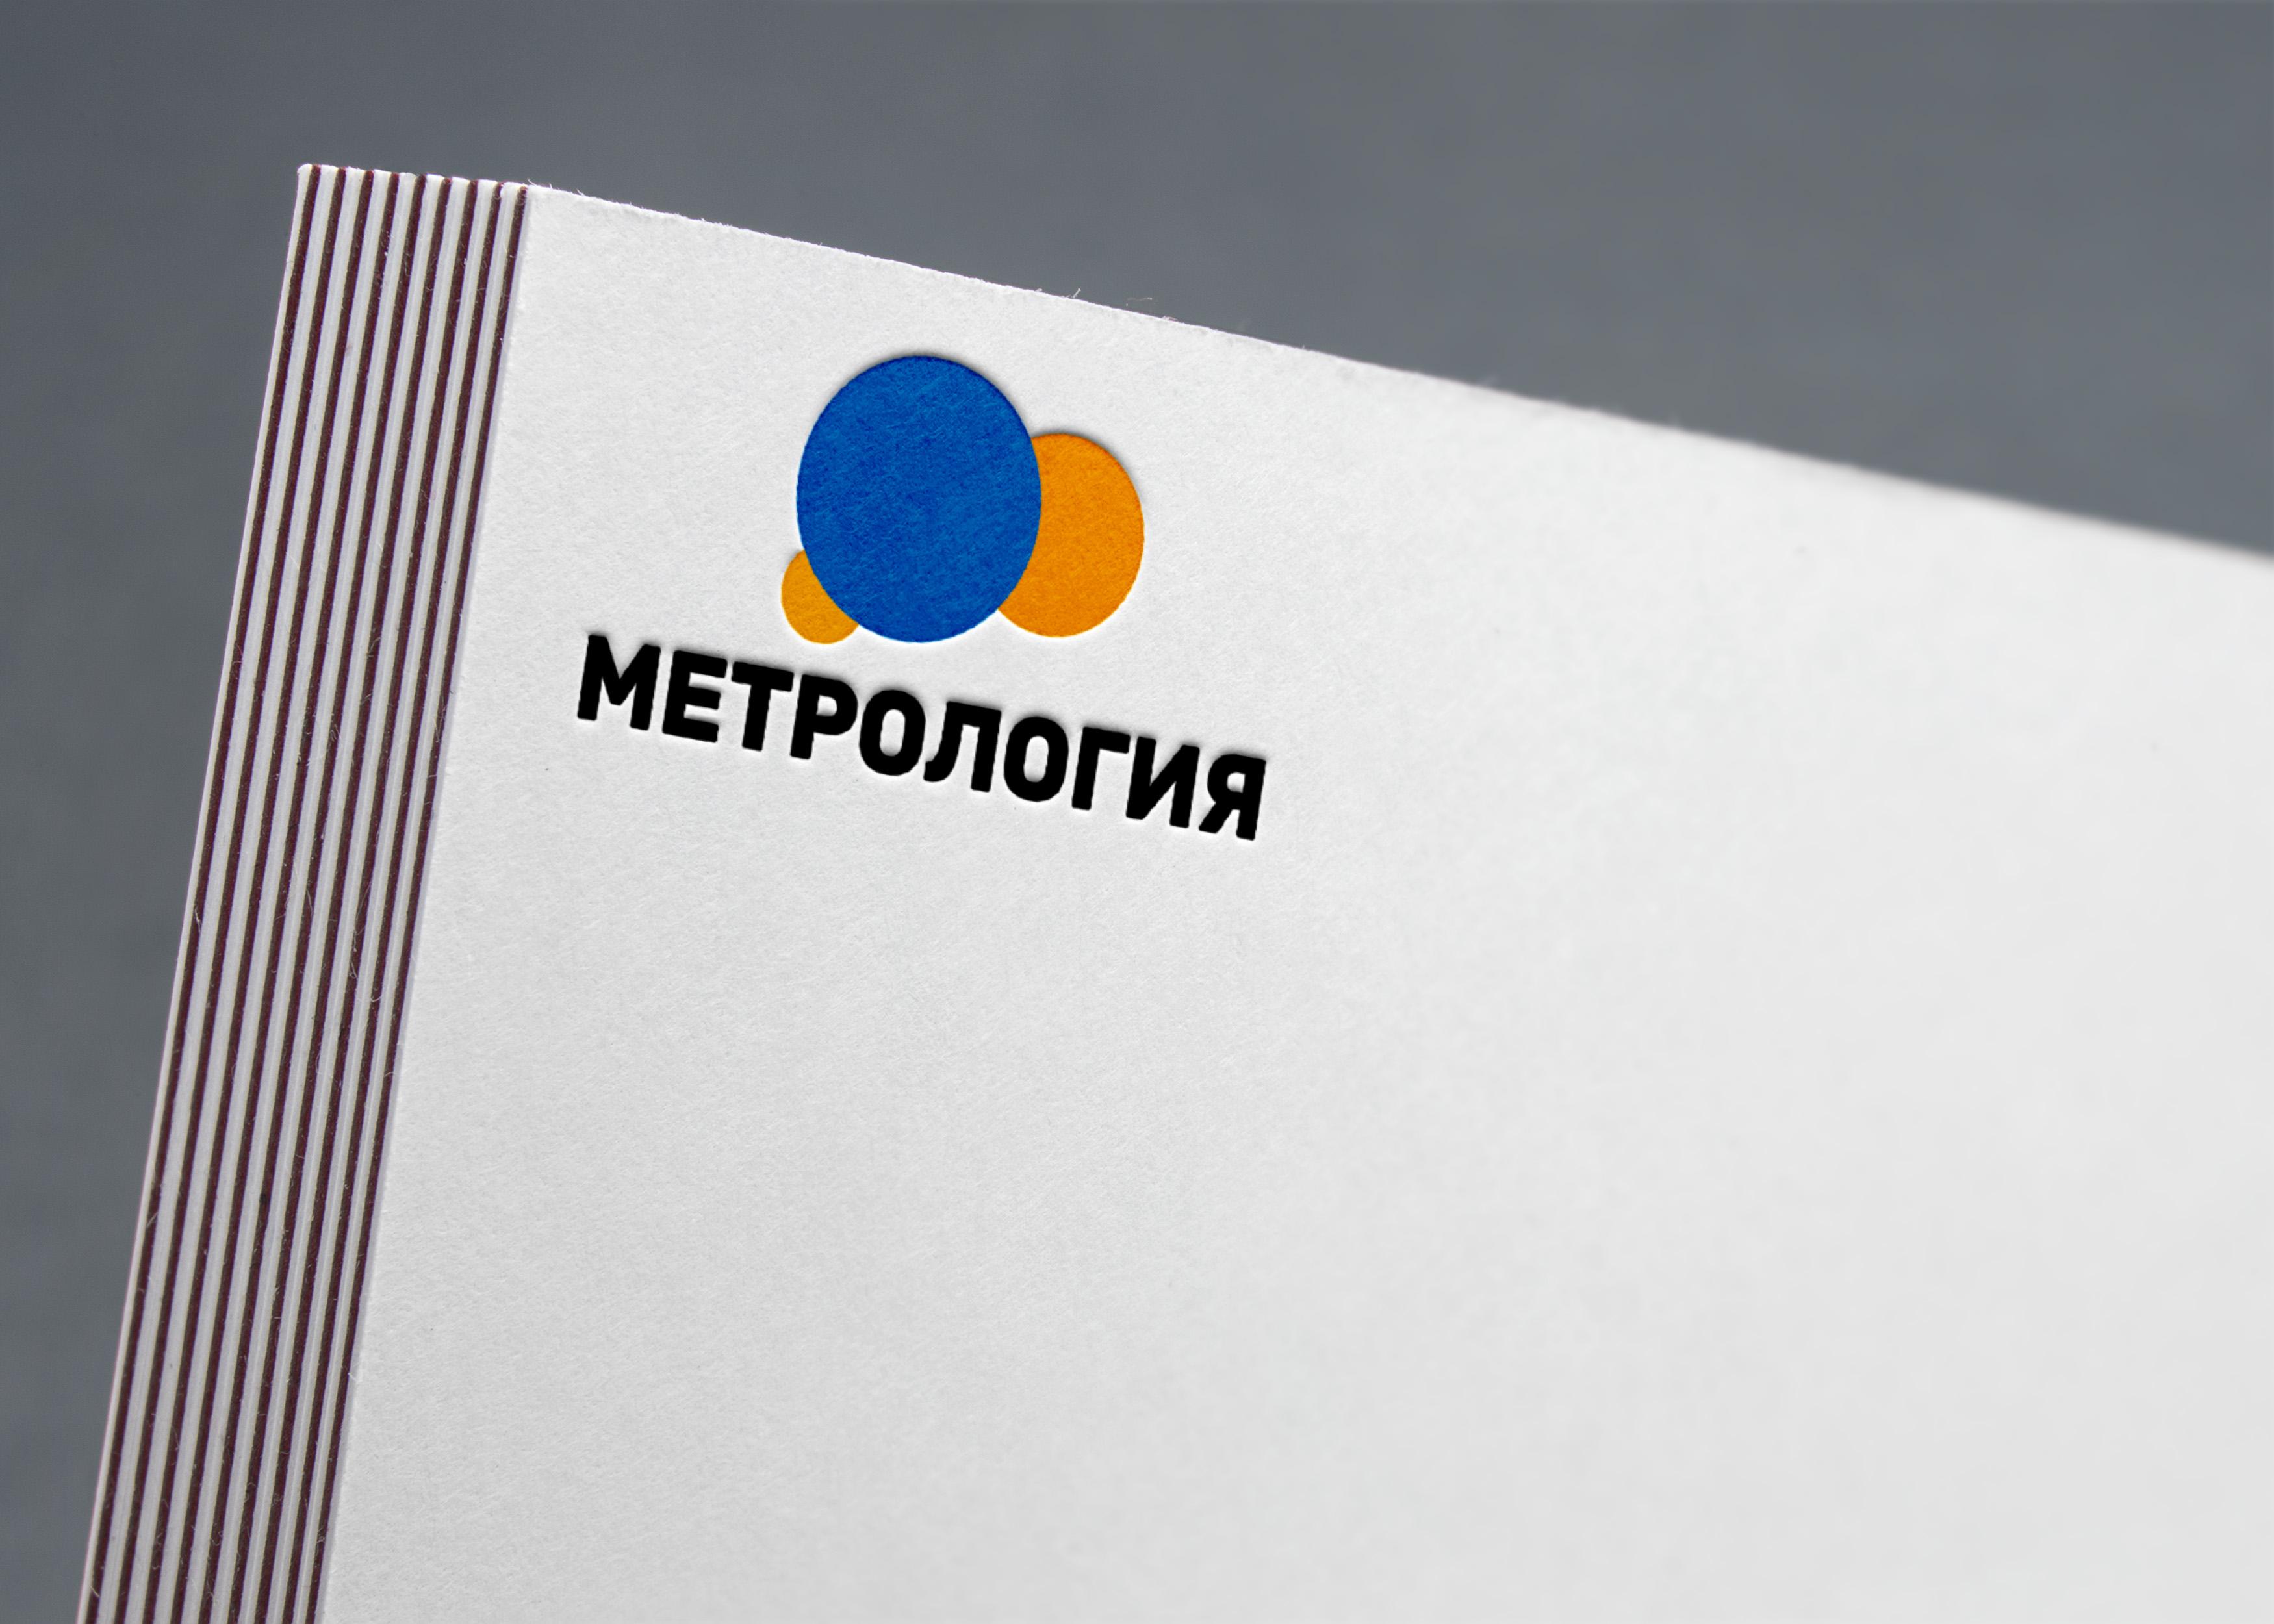 Разработать логотип, визитку, фирменный бланк. фото f_50958f4e3dd34291.jpg